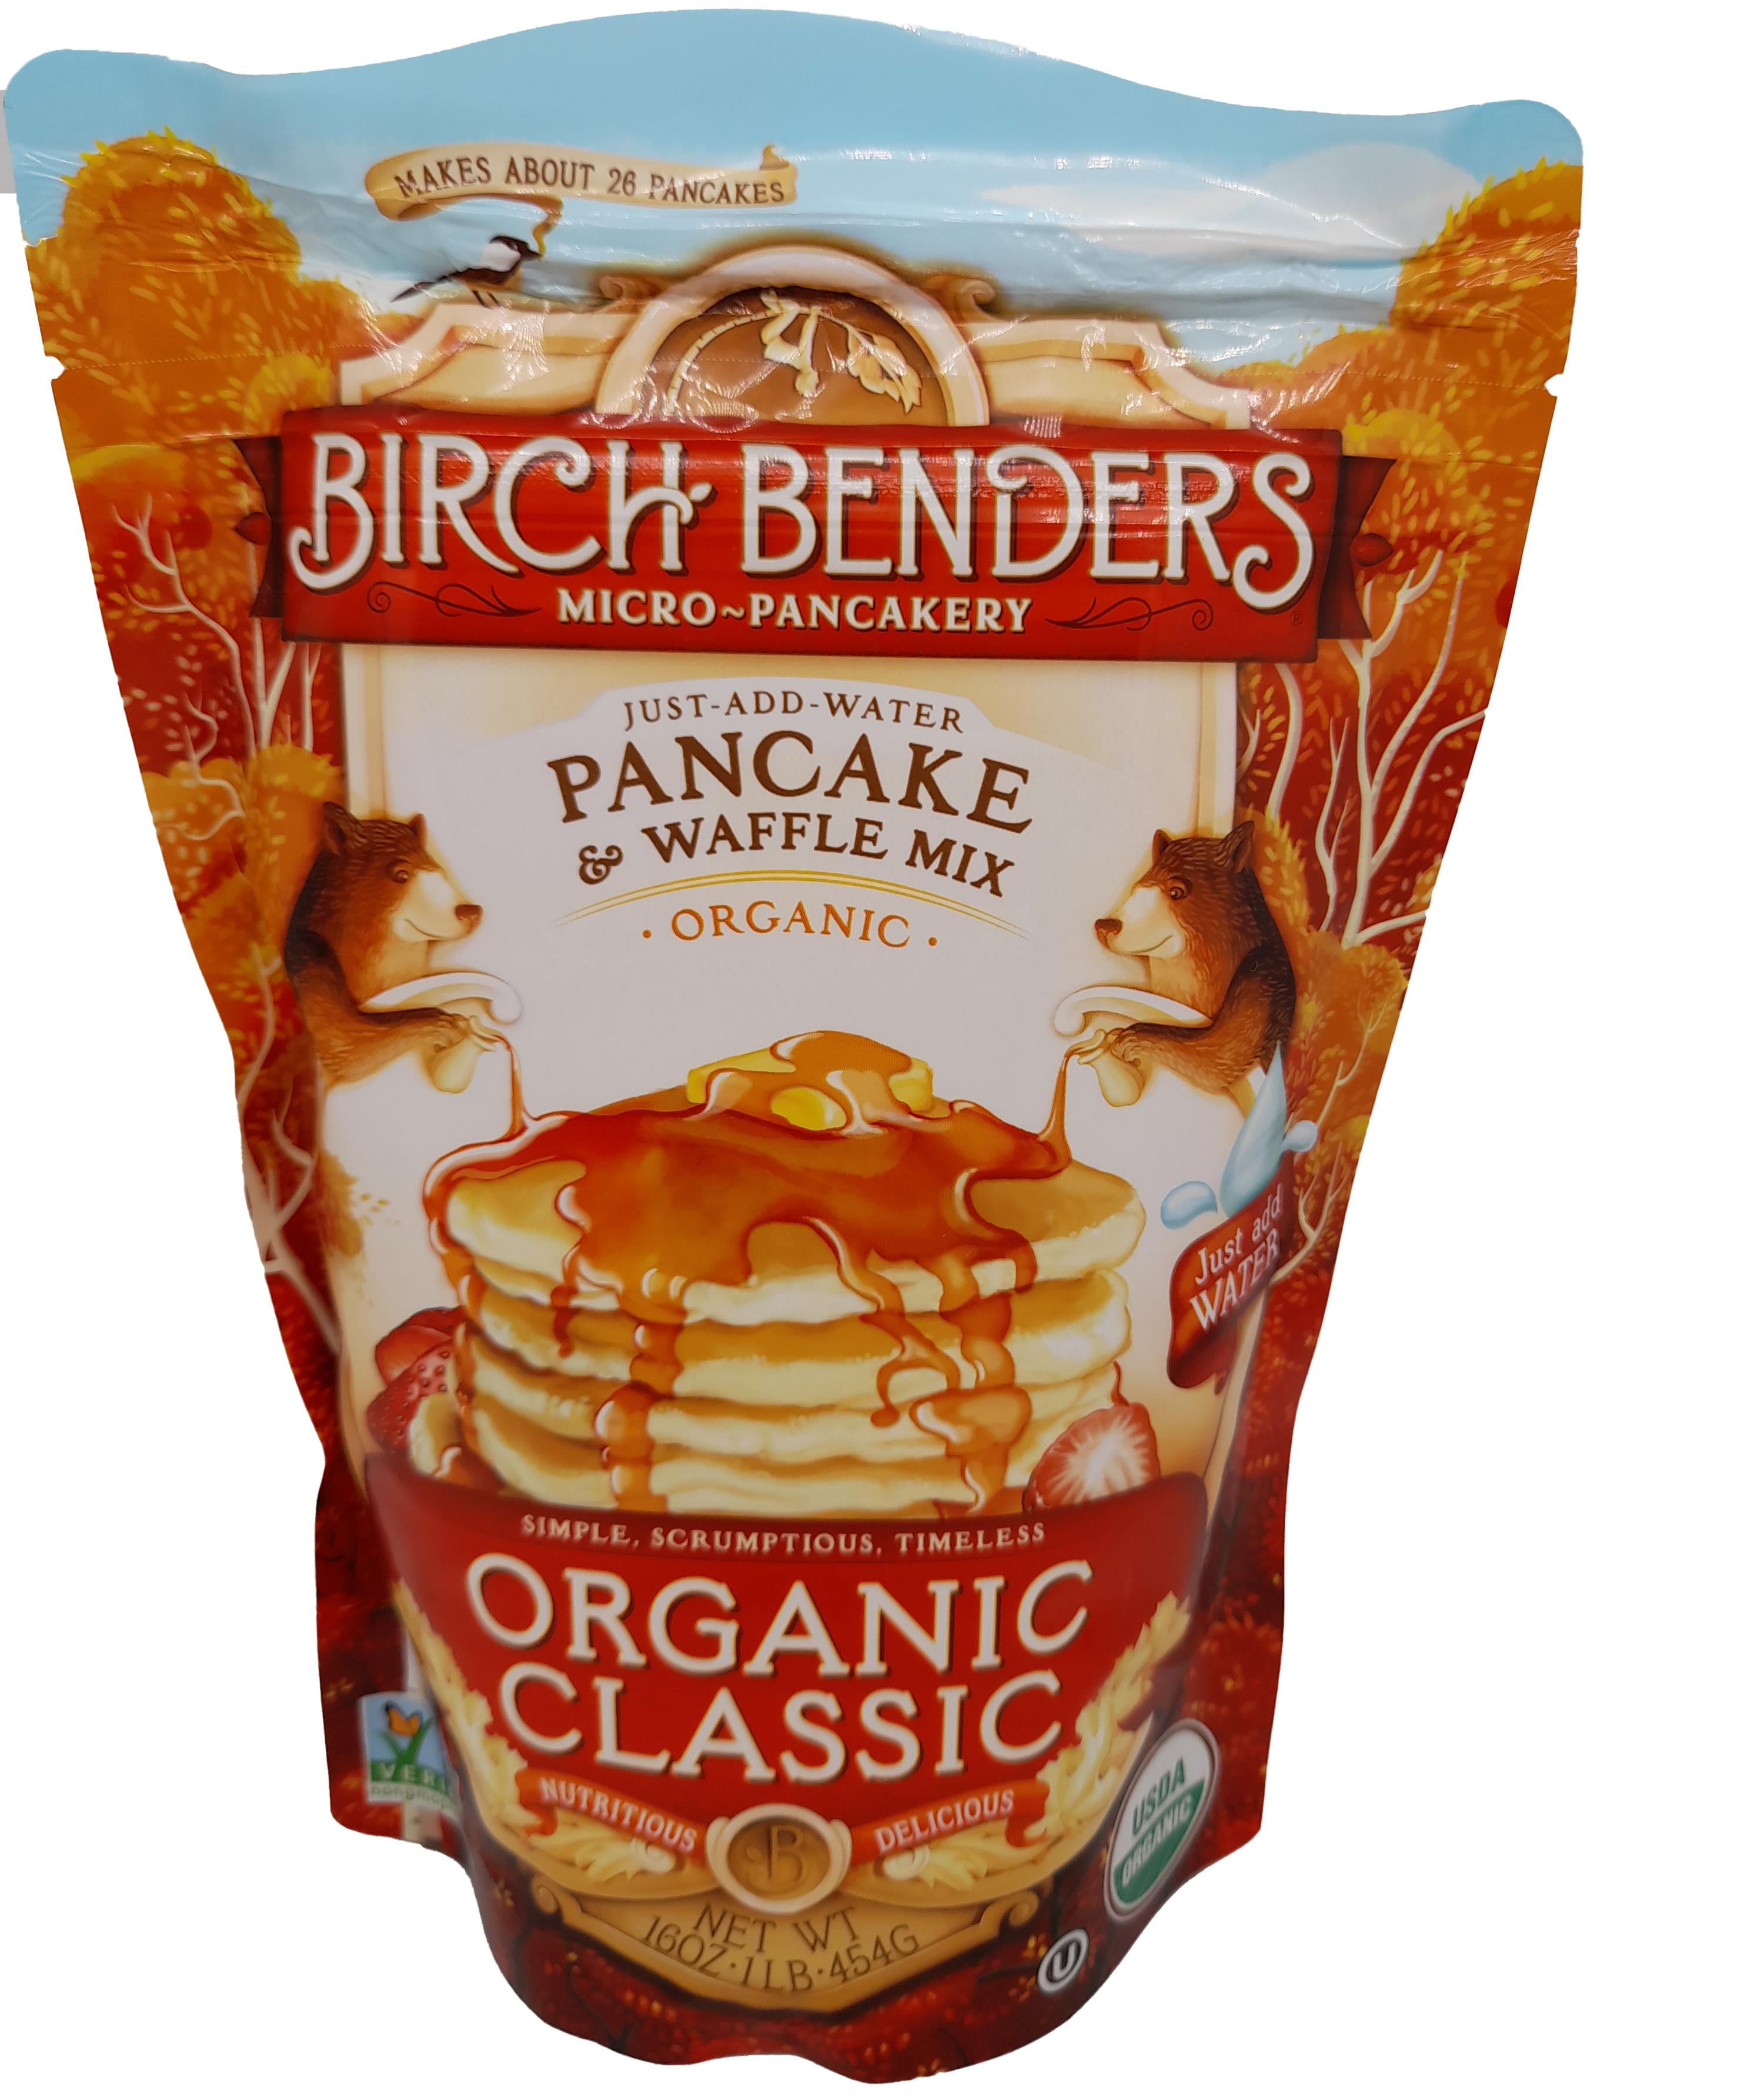 Birch Benders Organic Classic Pancake & Waffle Mix